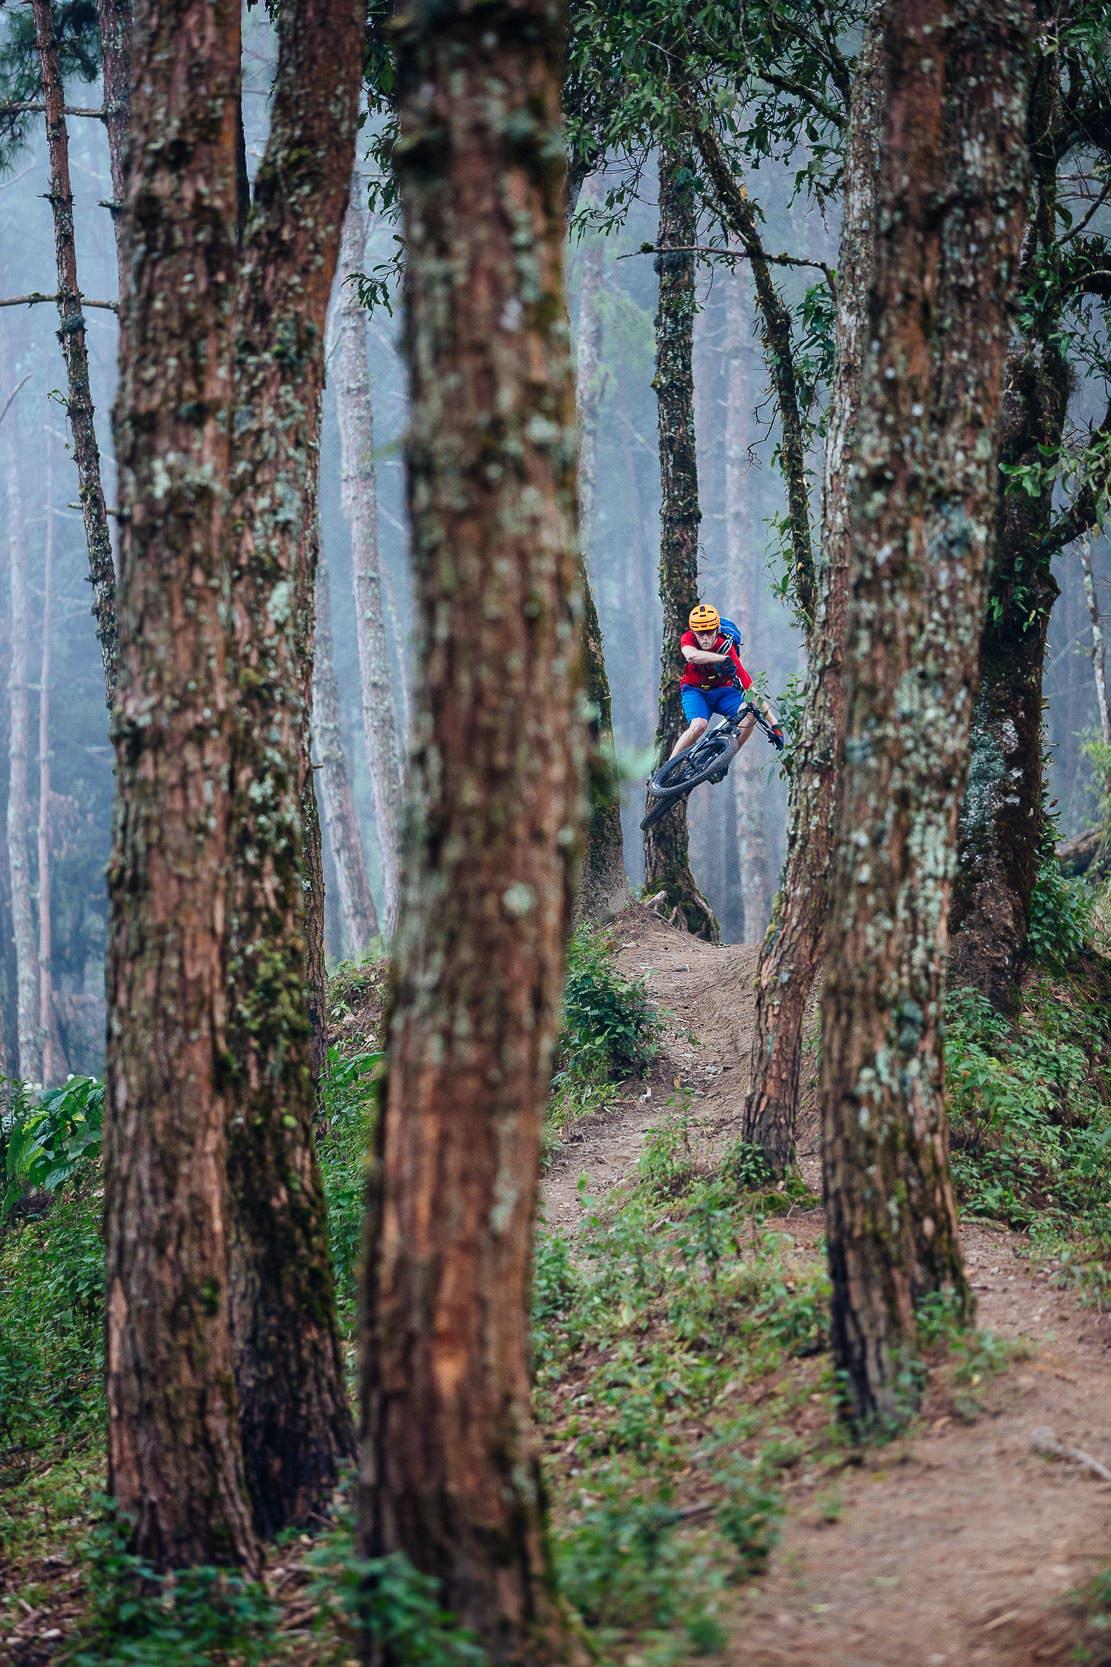 Andrew Whiteford rides the Doi Bakia Trail in the higher altitude jungle near Ban Sop Gai, Thailand